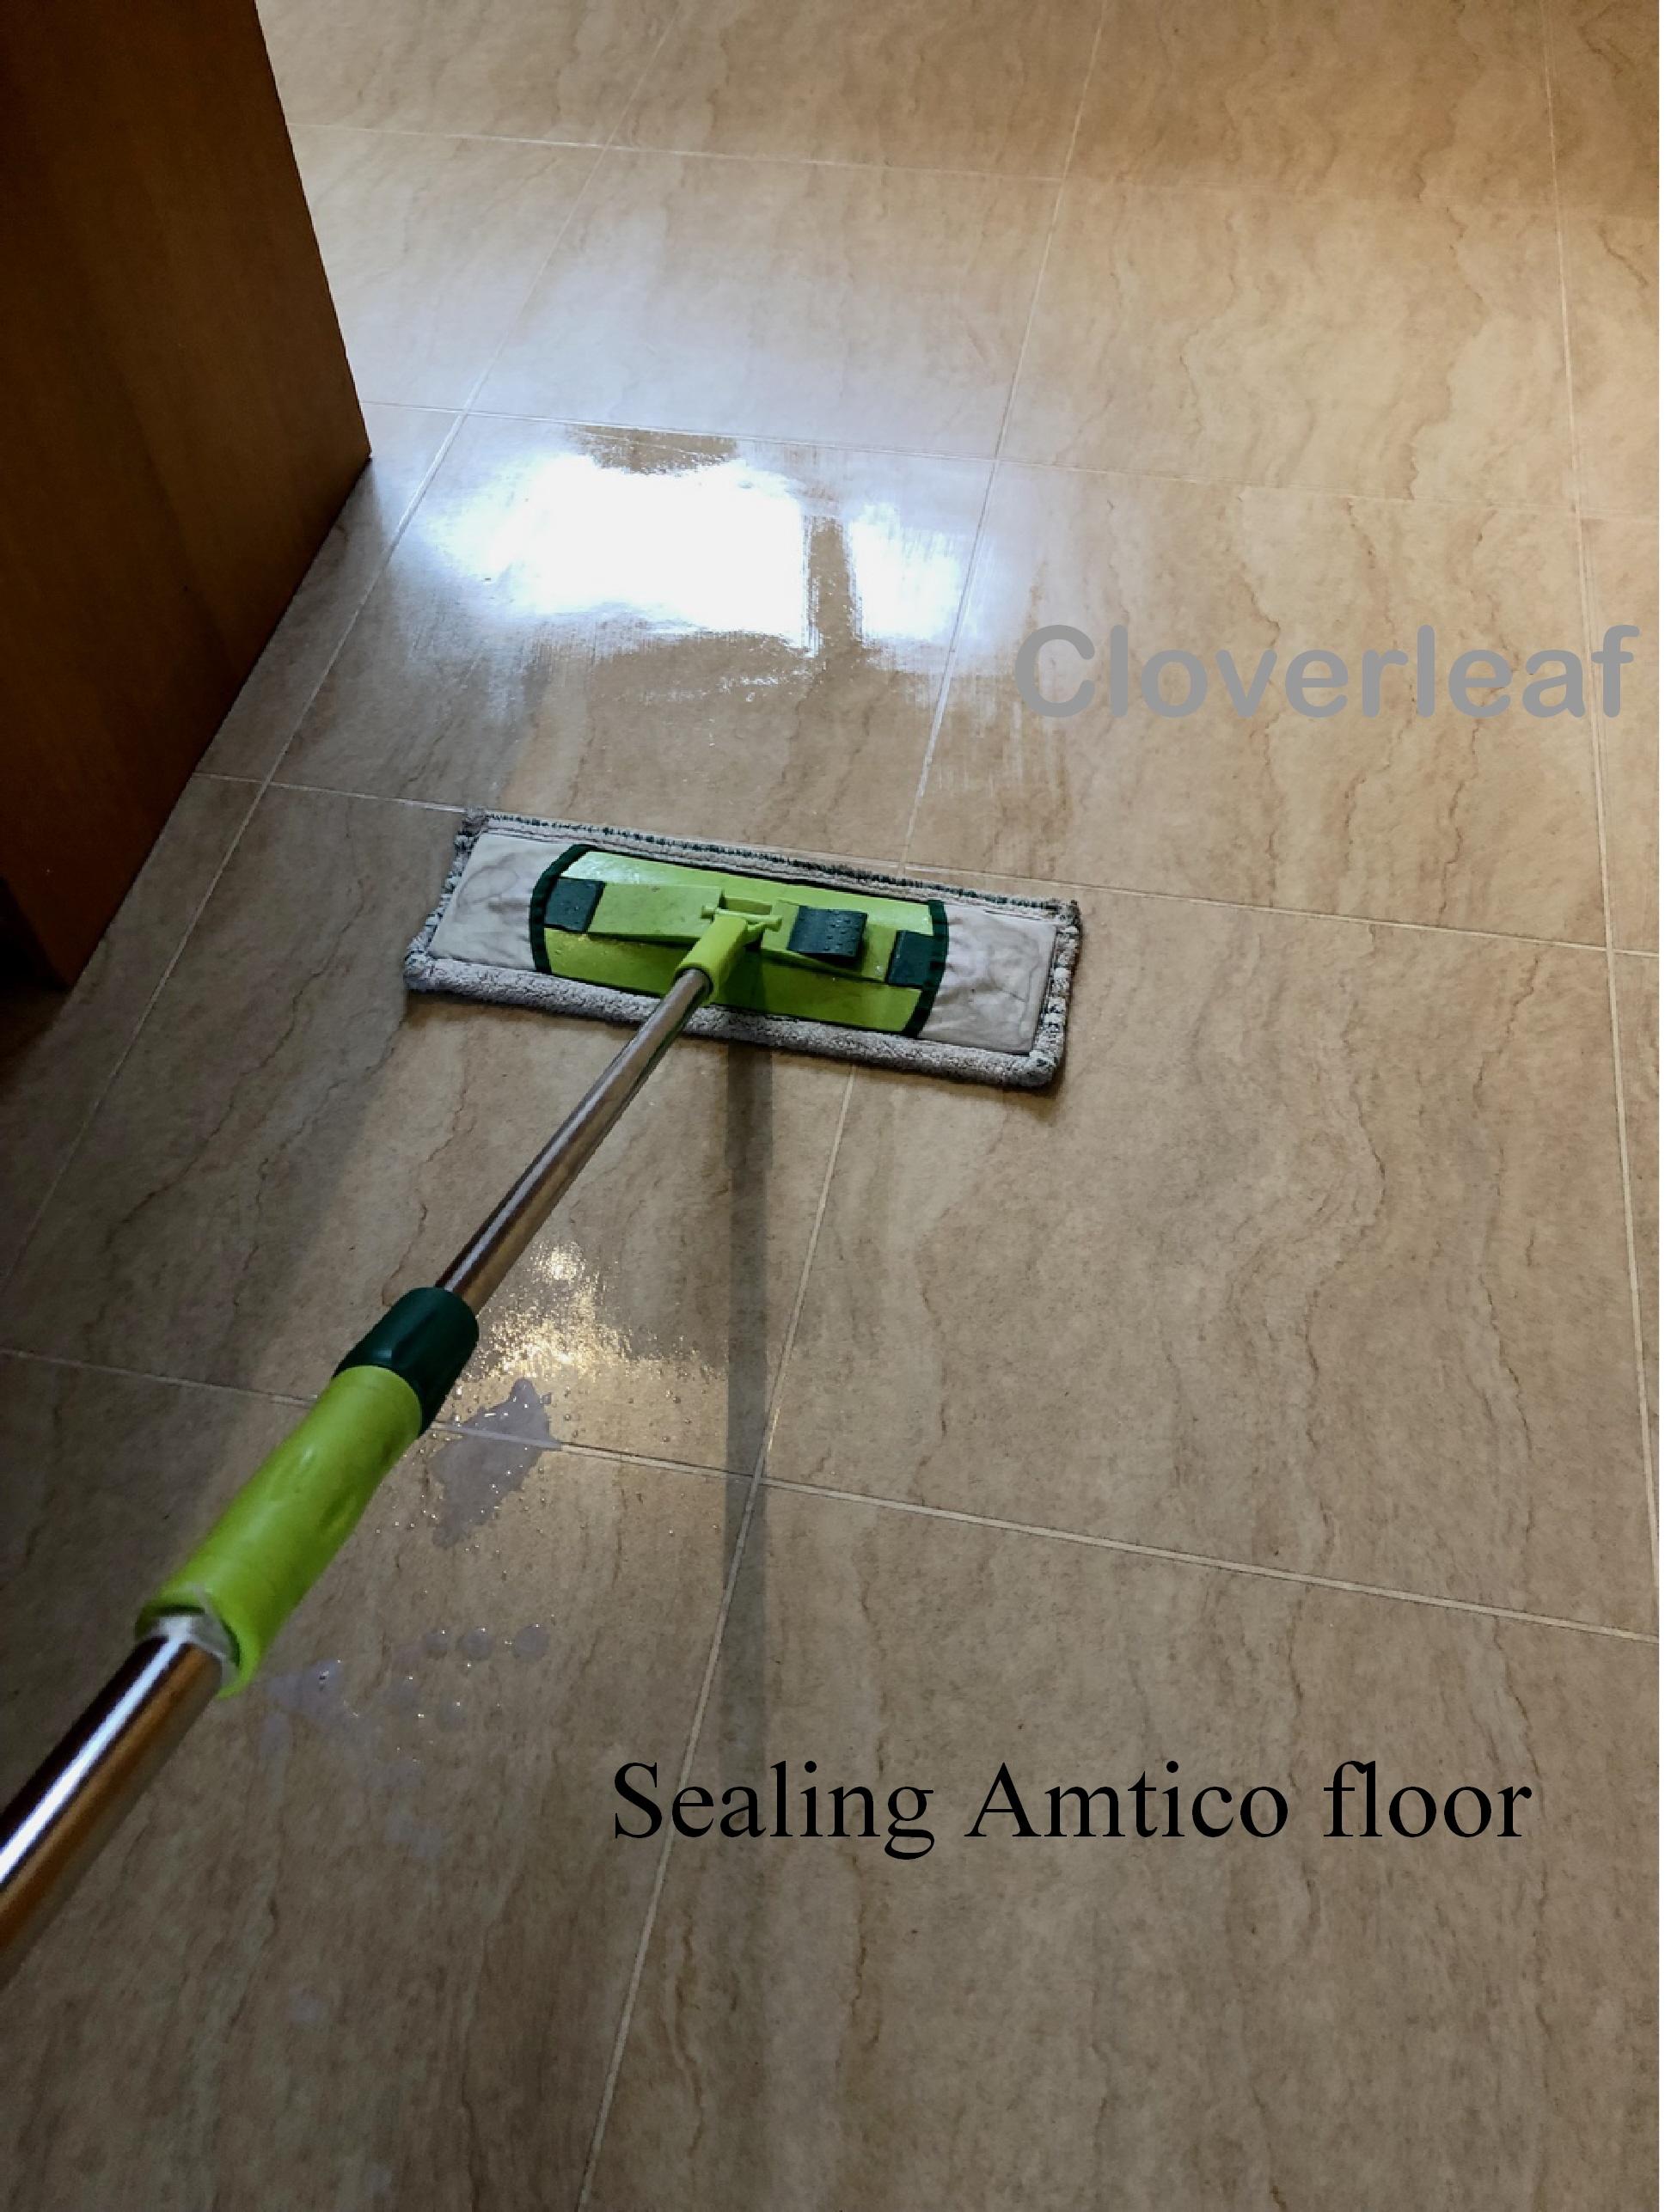 applying Amtico floor seal with mop